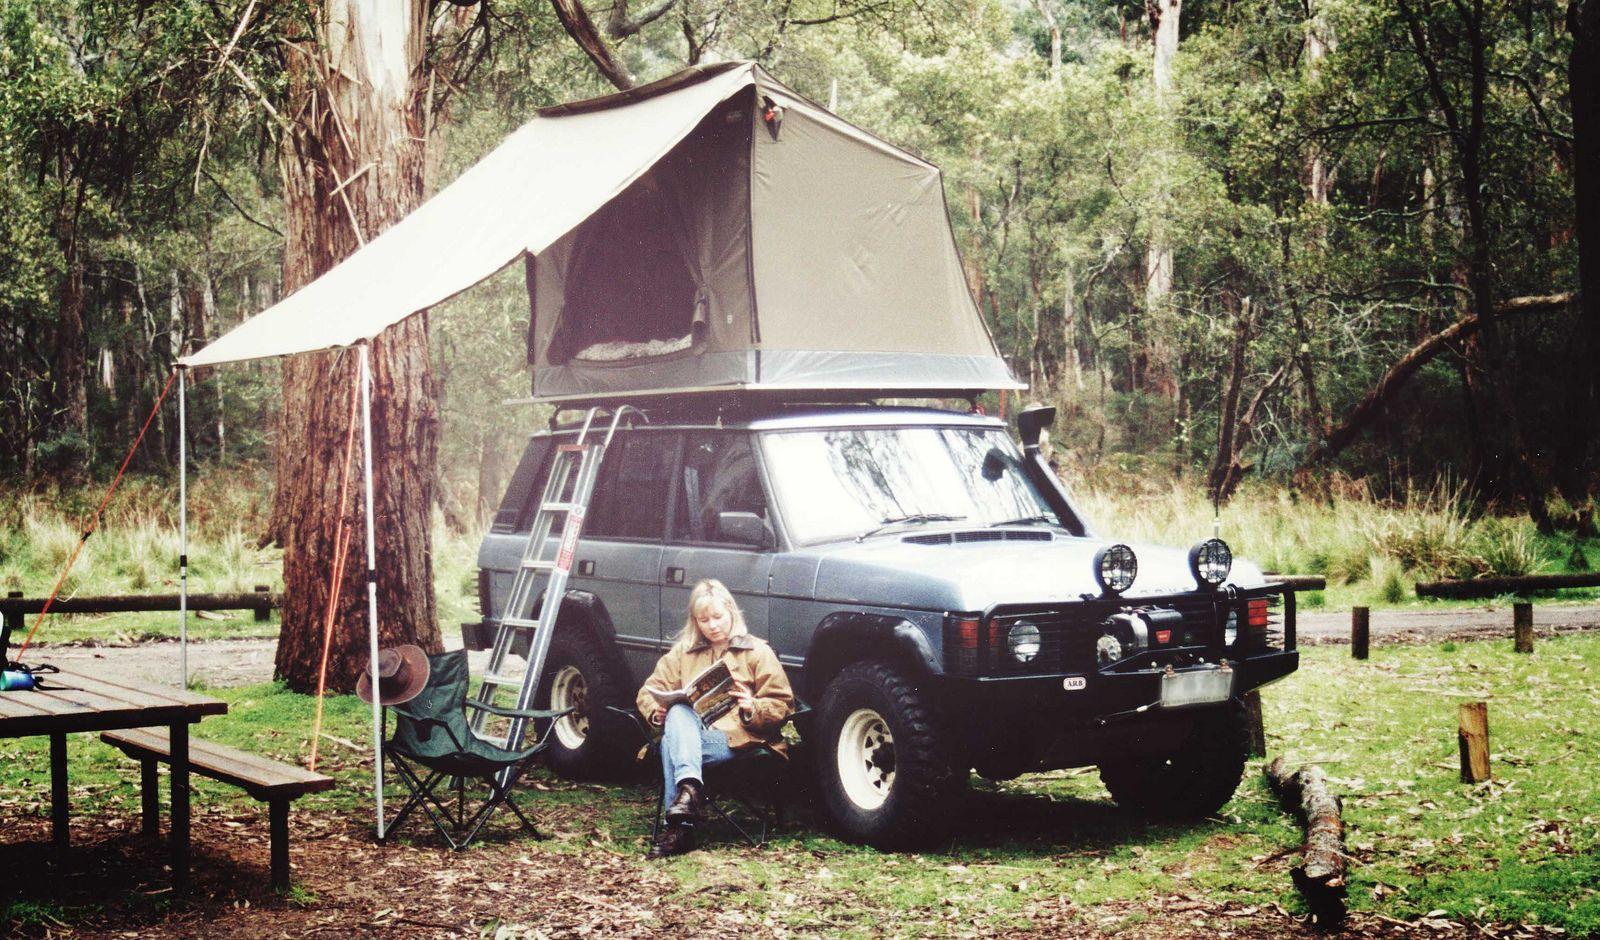 Oztent Rv 1 Roof Rack Happy Camper Trailer Tent Roof Rack